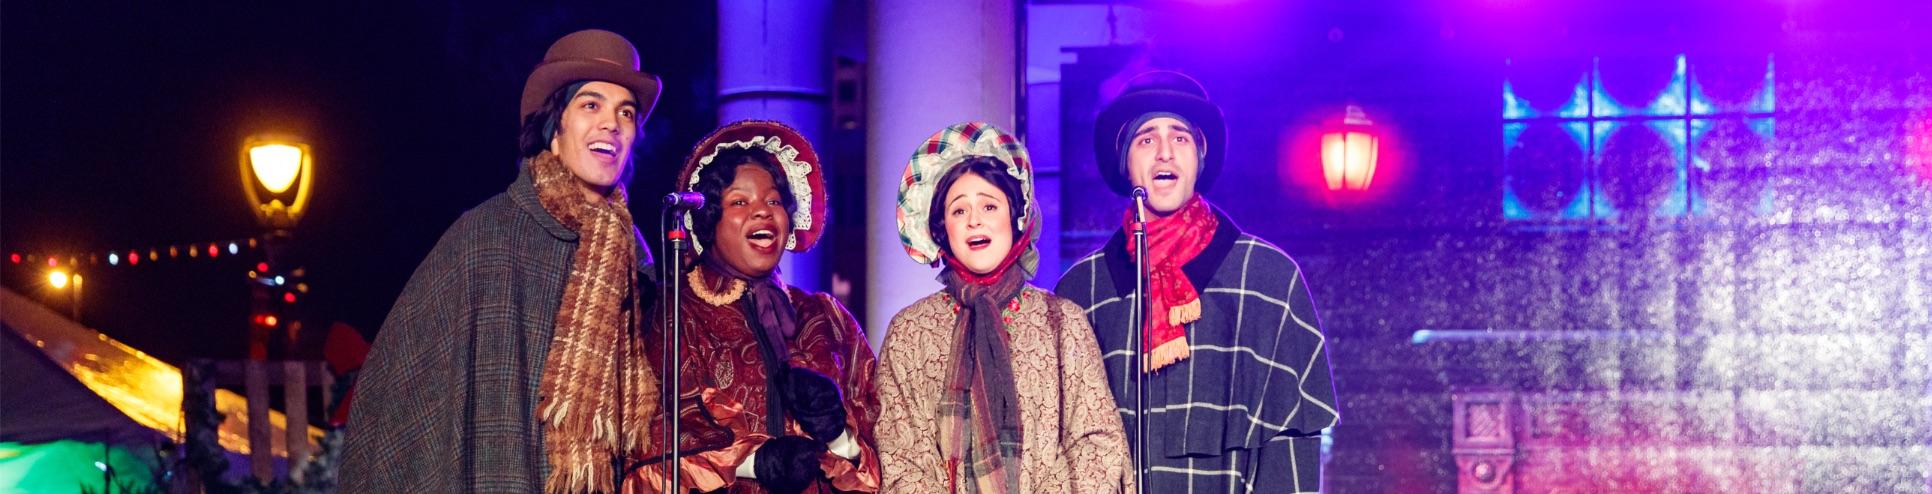 Milwaukee Rep Christmas Carol 2020 Milwaukee Rep Christmas Carol 2020 Denver | Fpzfxb.newyear2020blog